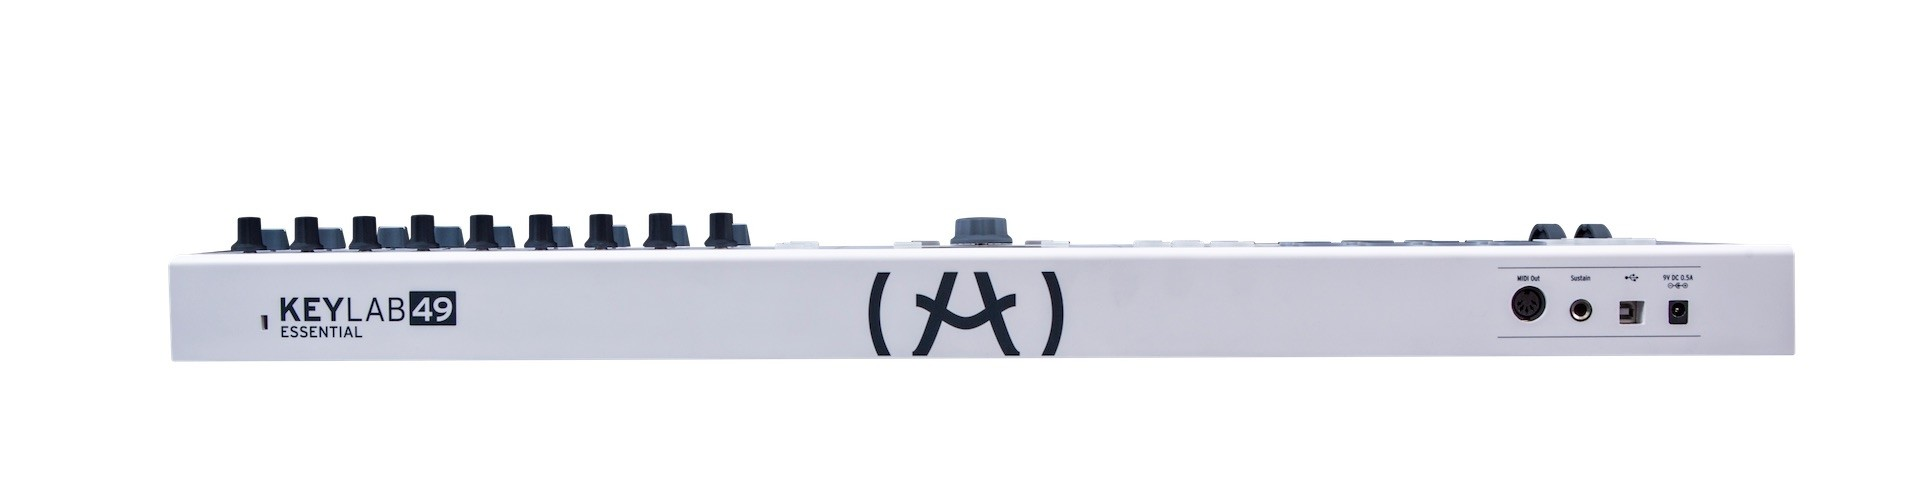 arturia keylab essential 49 giraffe audio. Black Bedroom Furniture Sets. Home Design Ideas